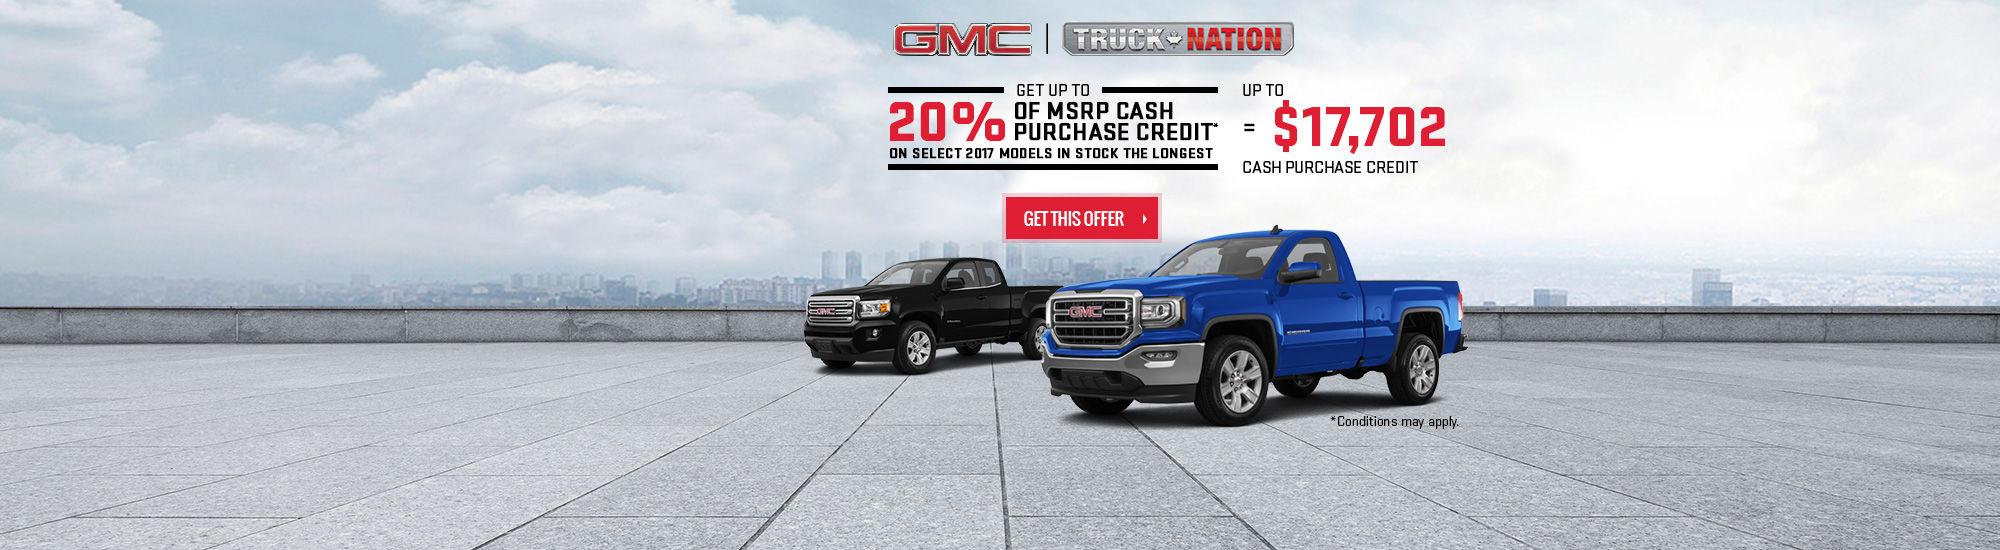 GMC - Truck Nation - July